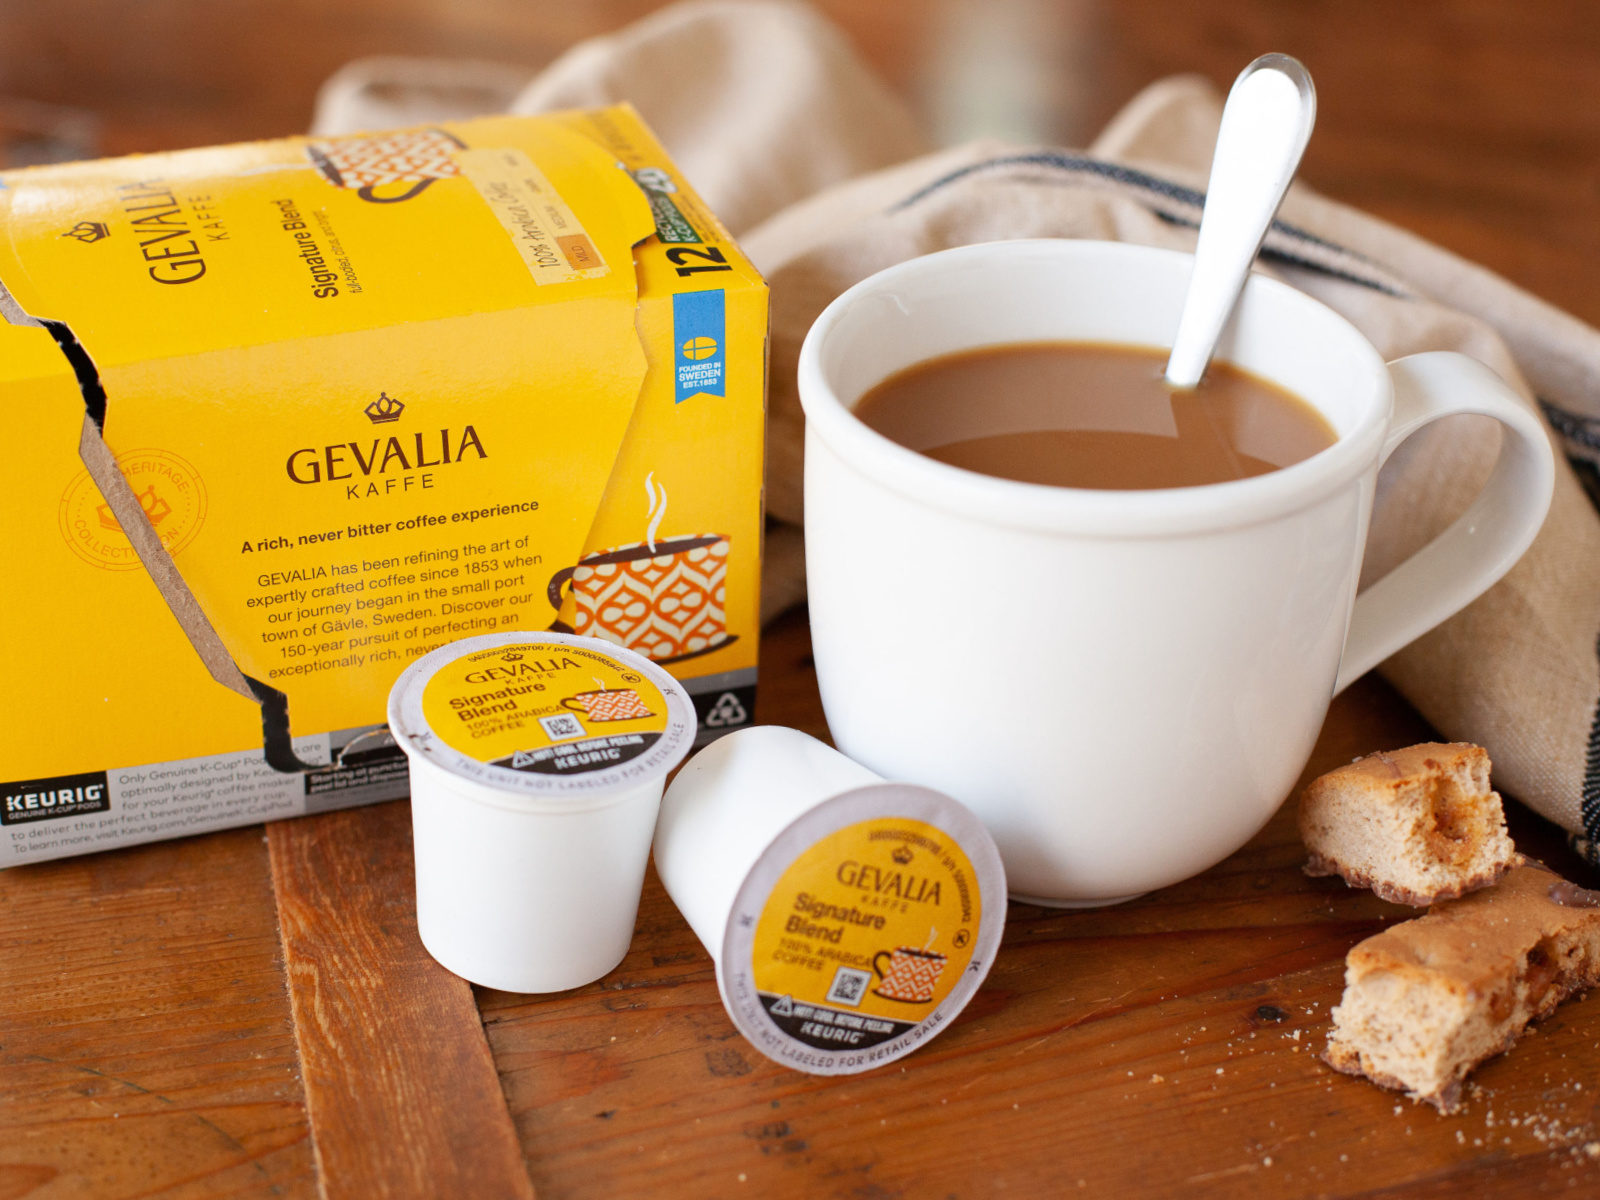 Don't Miss The Gevalia BOGO Sale At Publix - Choose The Coffee You Love & Save BIG! on I Heart Publix